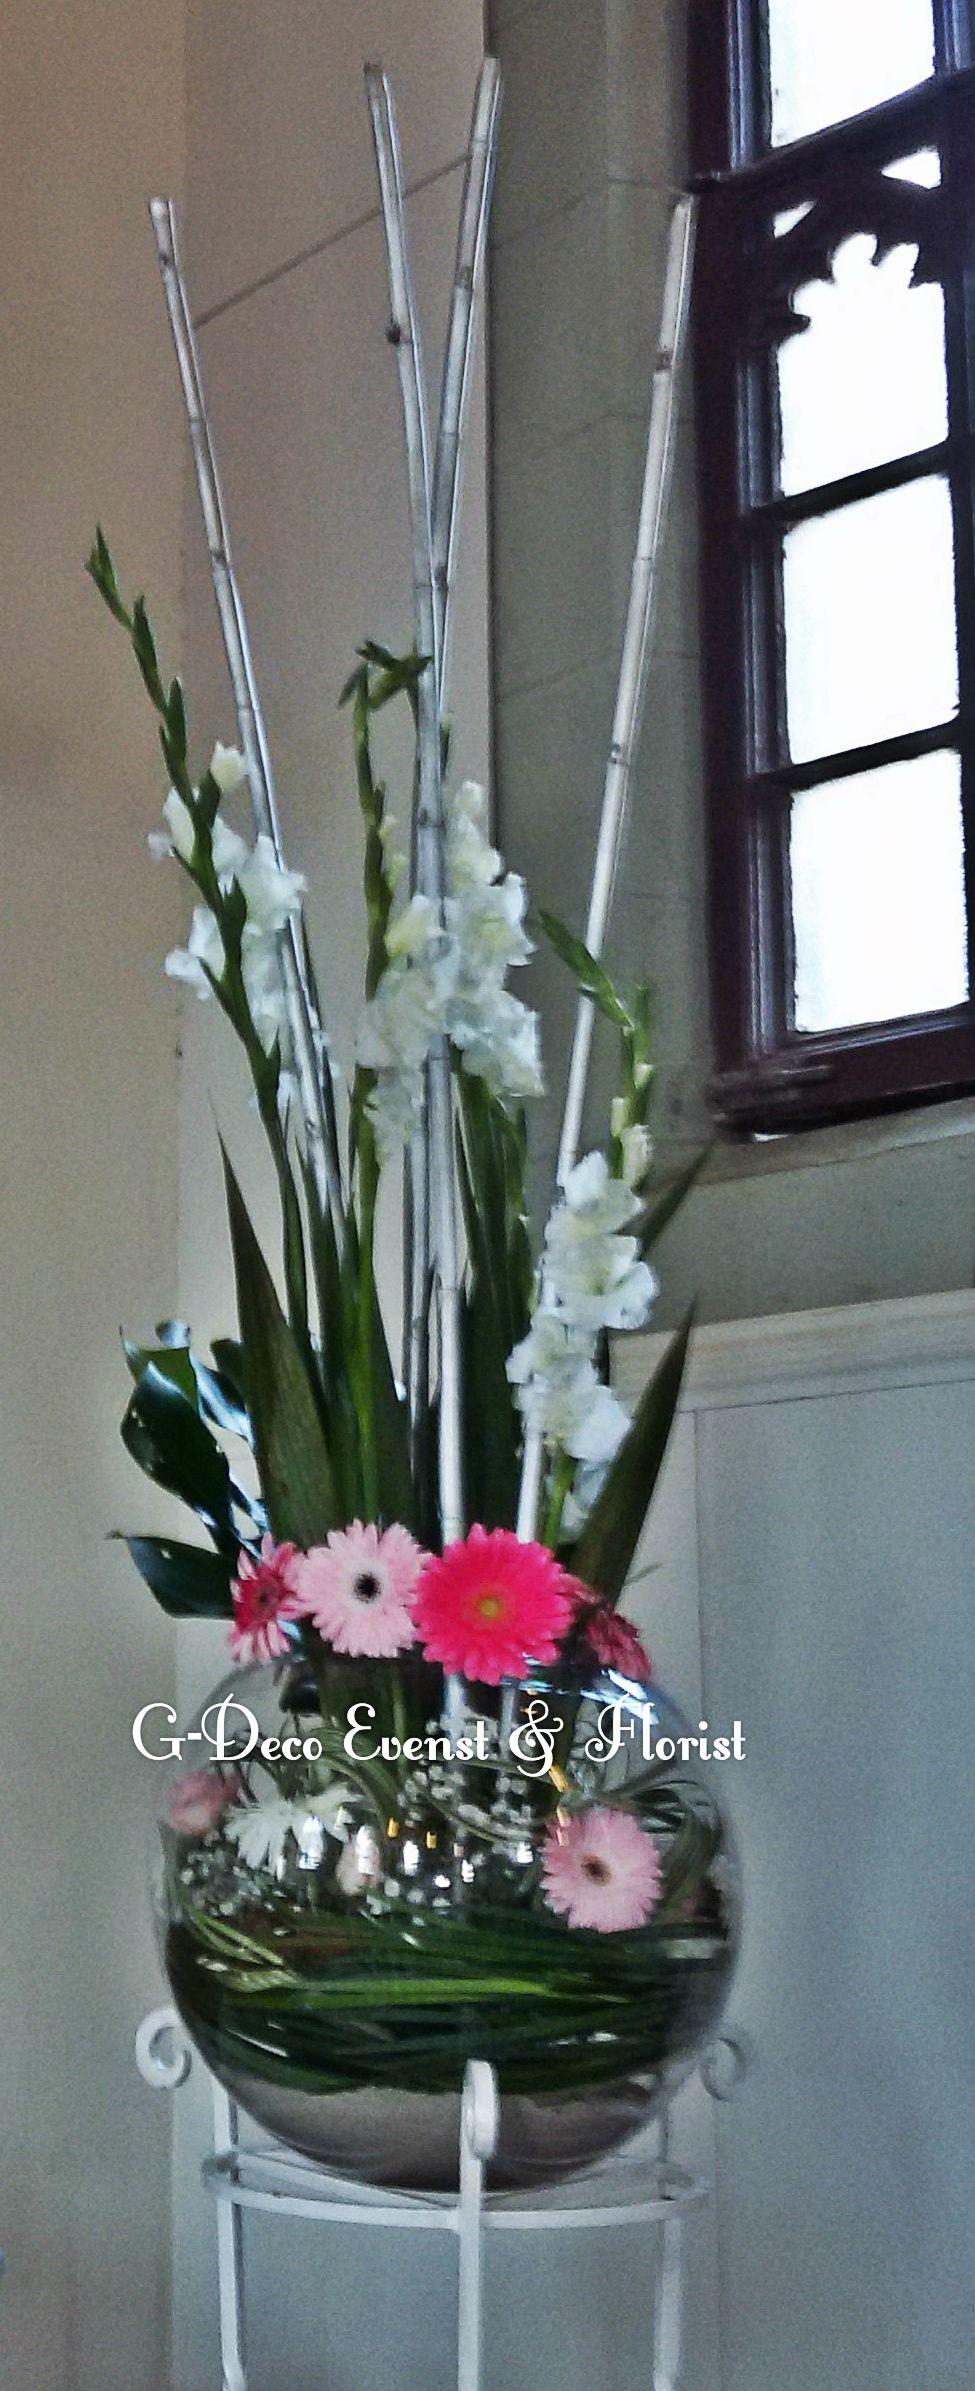 Vase Fish Ball Sur Sten En Fer Fleurs Gerbera Rose Gypsophile